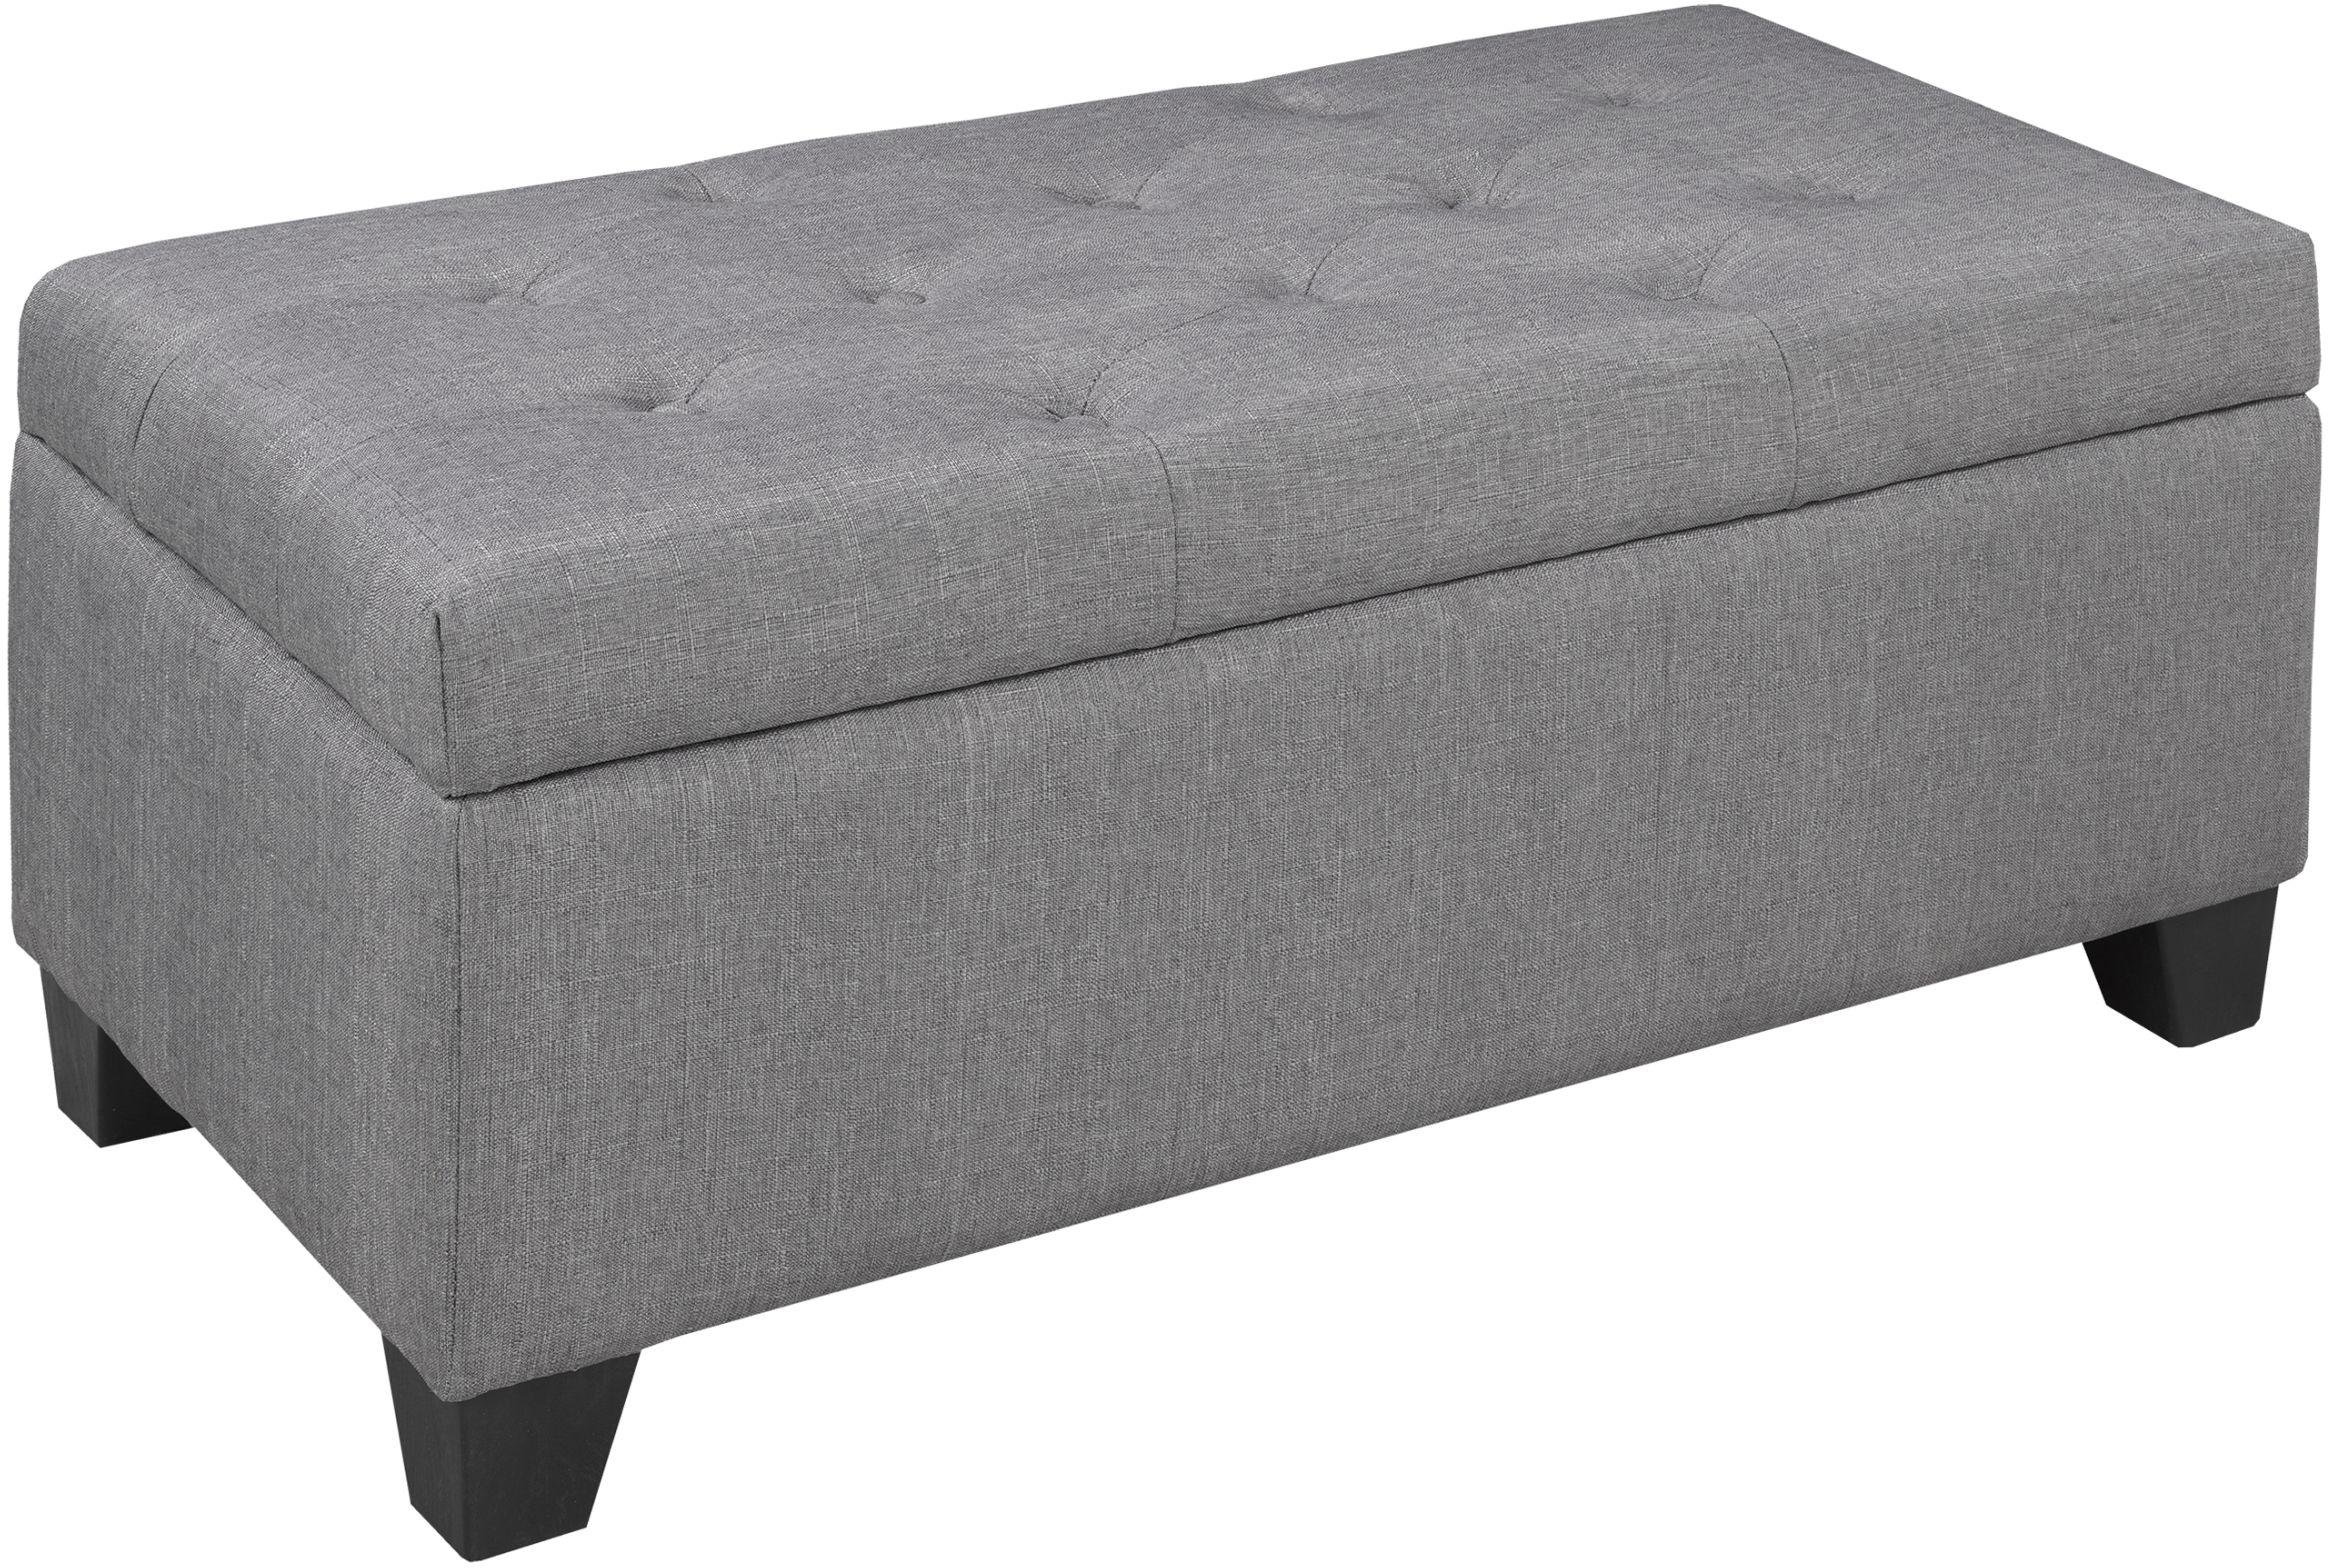 brassex tufted storage ottoman grey br 20091 gr modern furniture canada